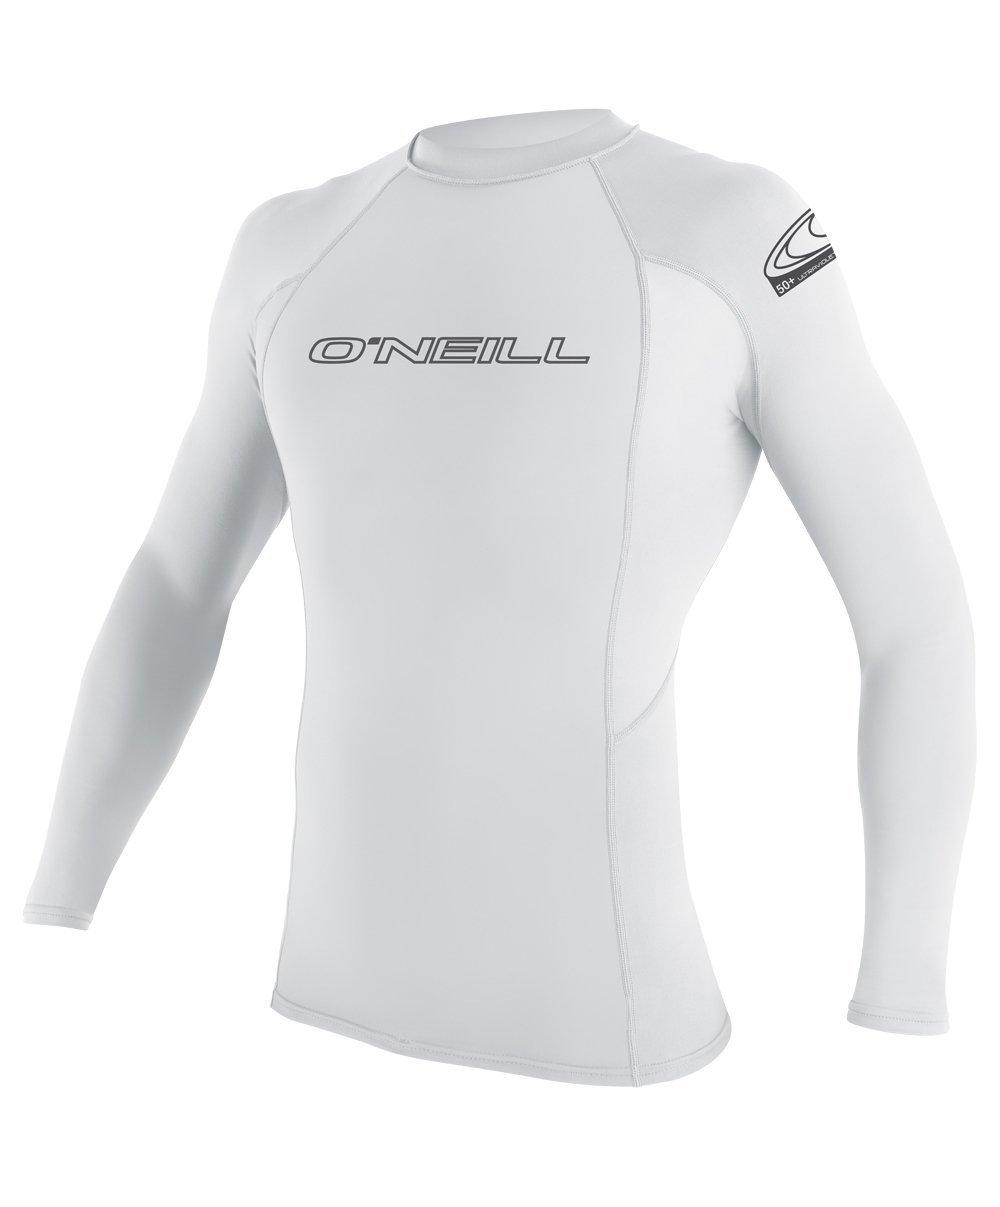 O'Neill Men's Basic Skins UPF 50+ Long Sleeve Rash Guard, White, Small